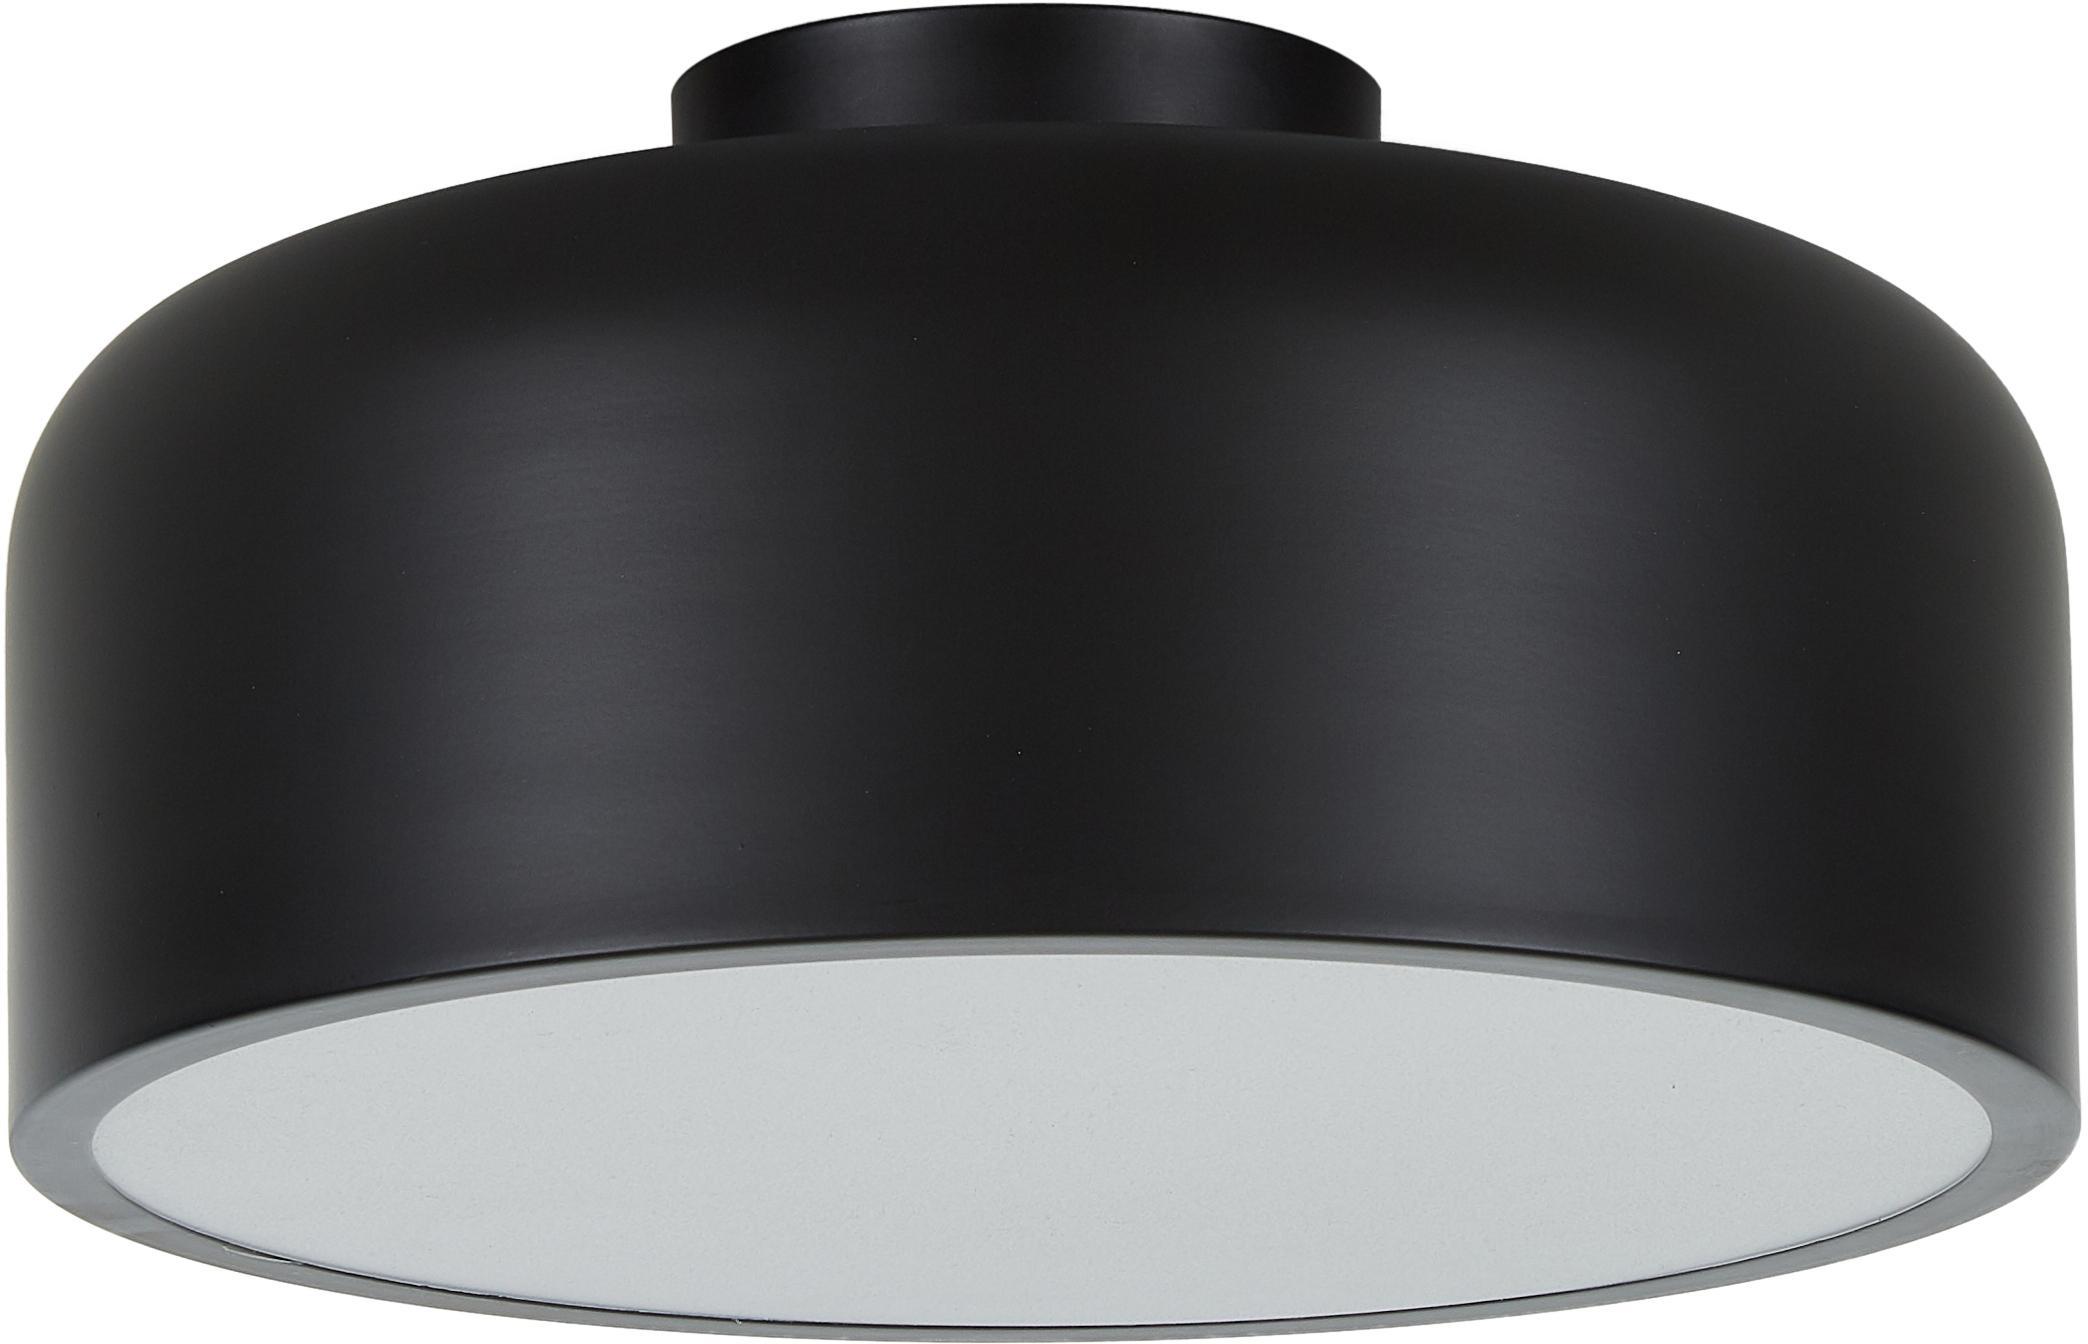 Plafondlamp Ole, Diffuser: acryl, Mat zwart, Ø 35 x H 18 cm